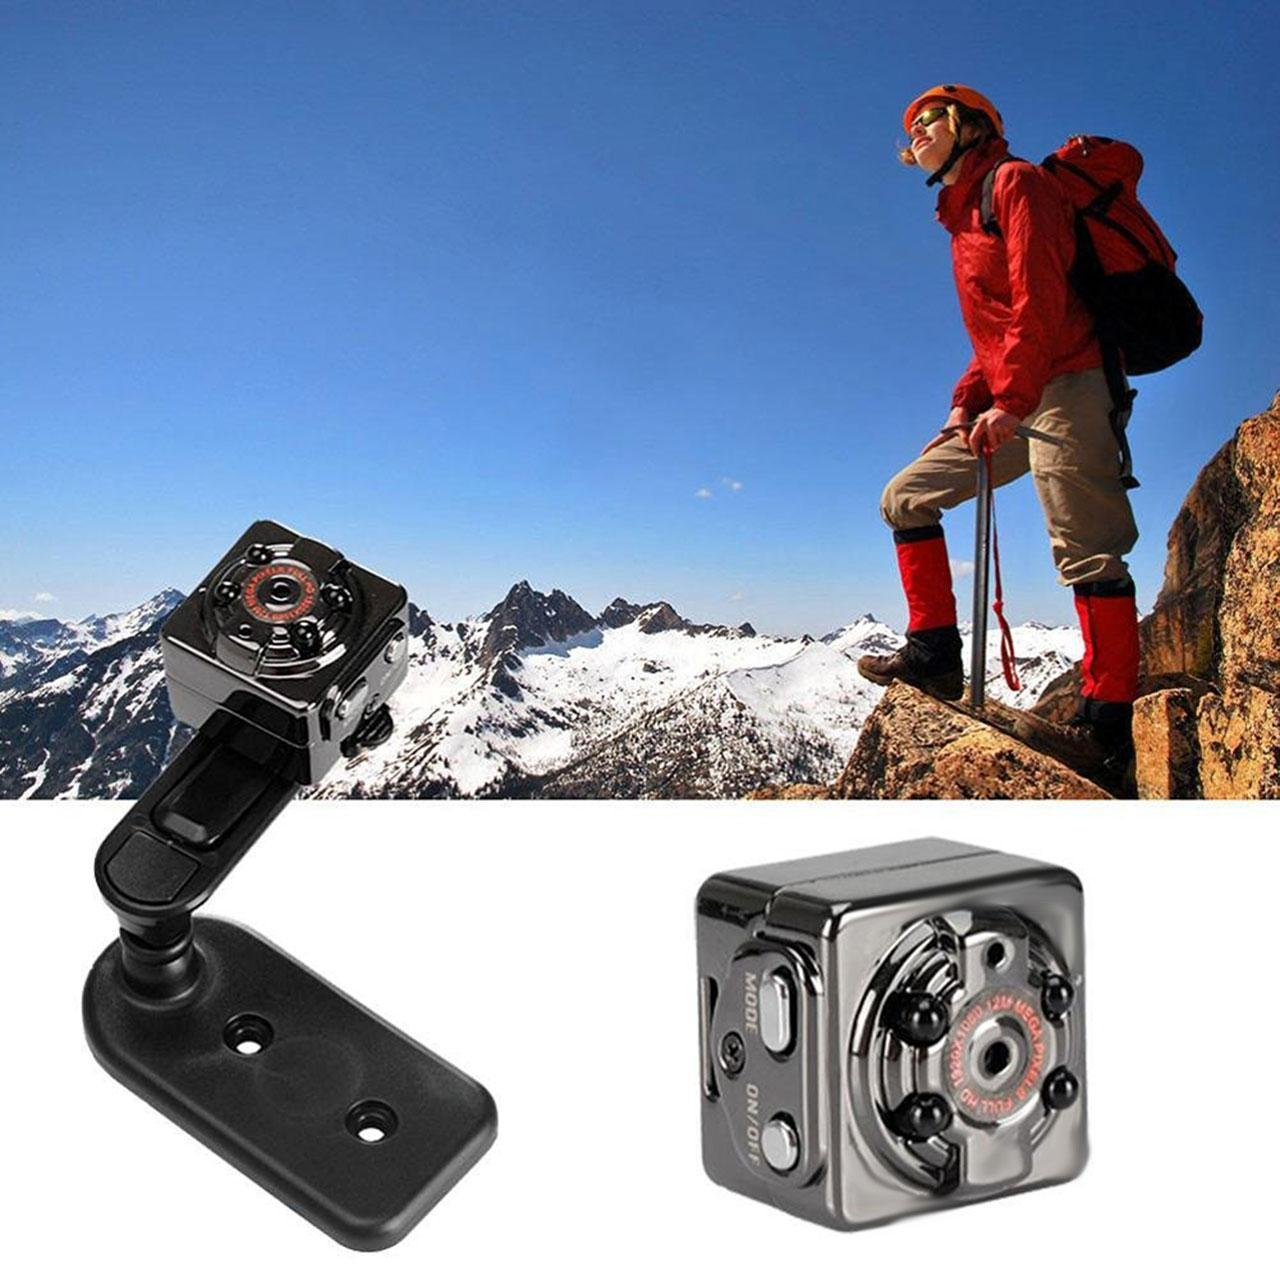 8G Card+High Definition SQ8 MINI Camera TF Card Voice Recorder Night Vision DV Car DVR8G Card+High Definition SQ8 MINI Camera TF Card Voice Recorder Night Vision DV Car DVR